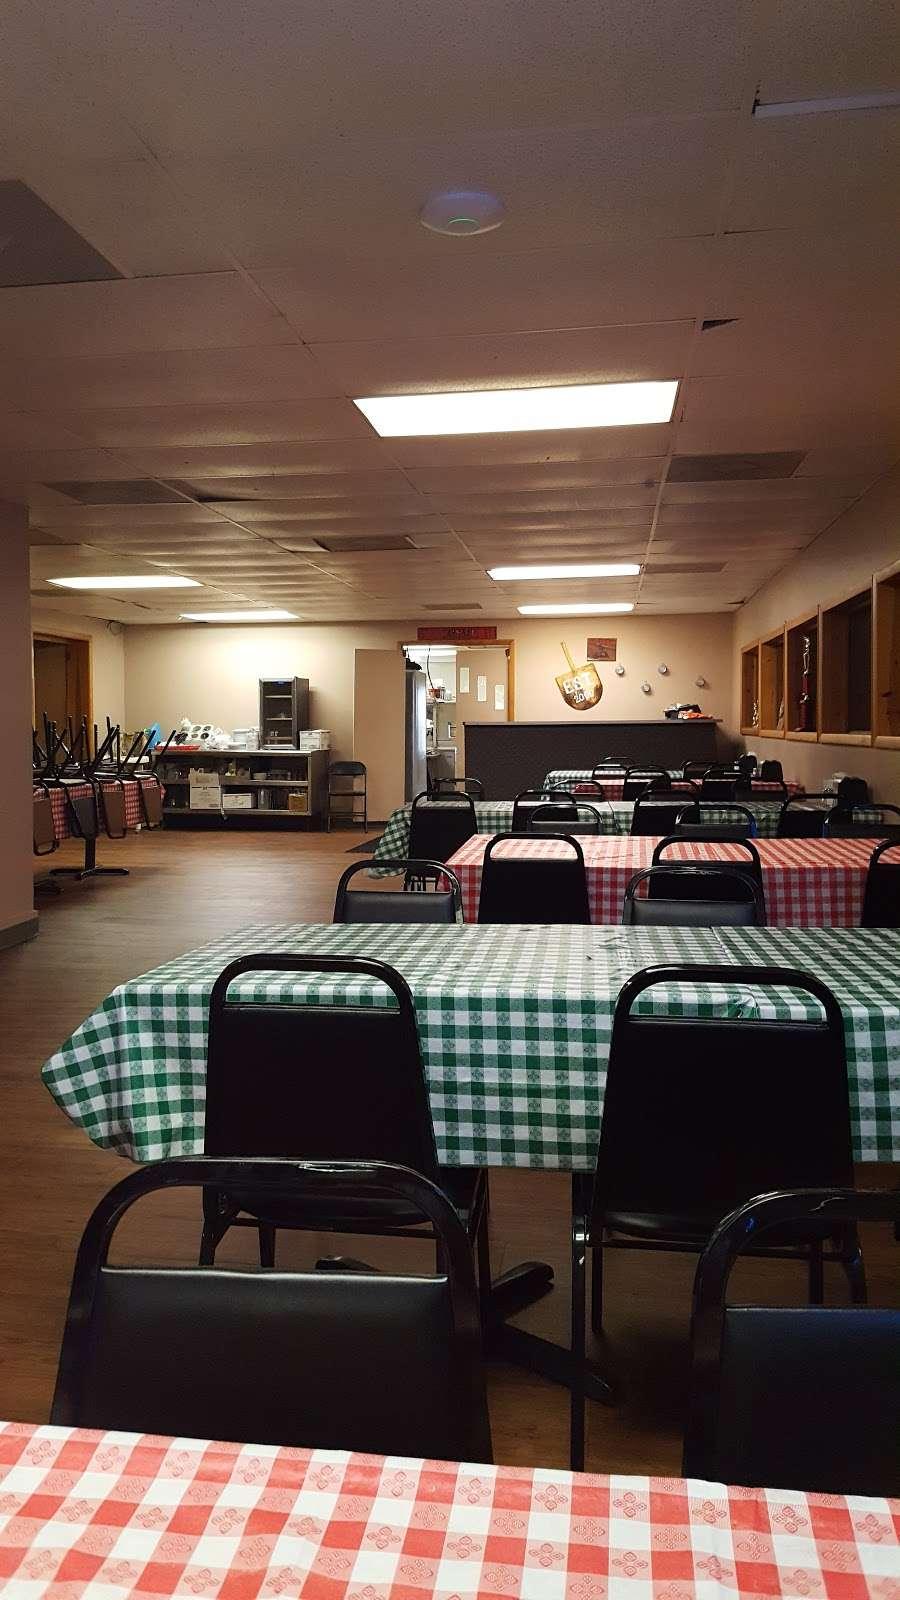 Rurys Tap - restaurant  | Photo 2 of 6 | Address: 365 Lake St, South Wilmington, IL 60474, USA | Phone: (815) 237-2756